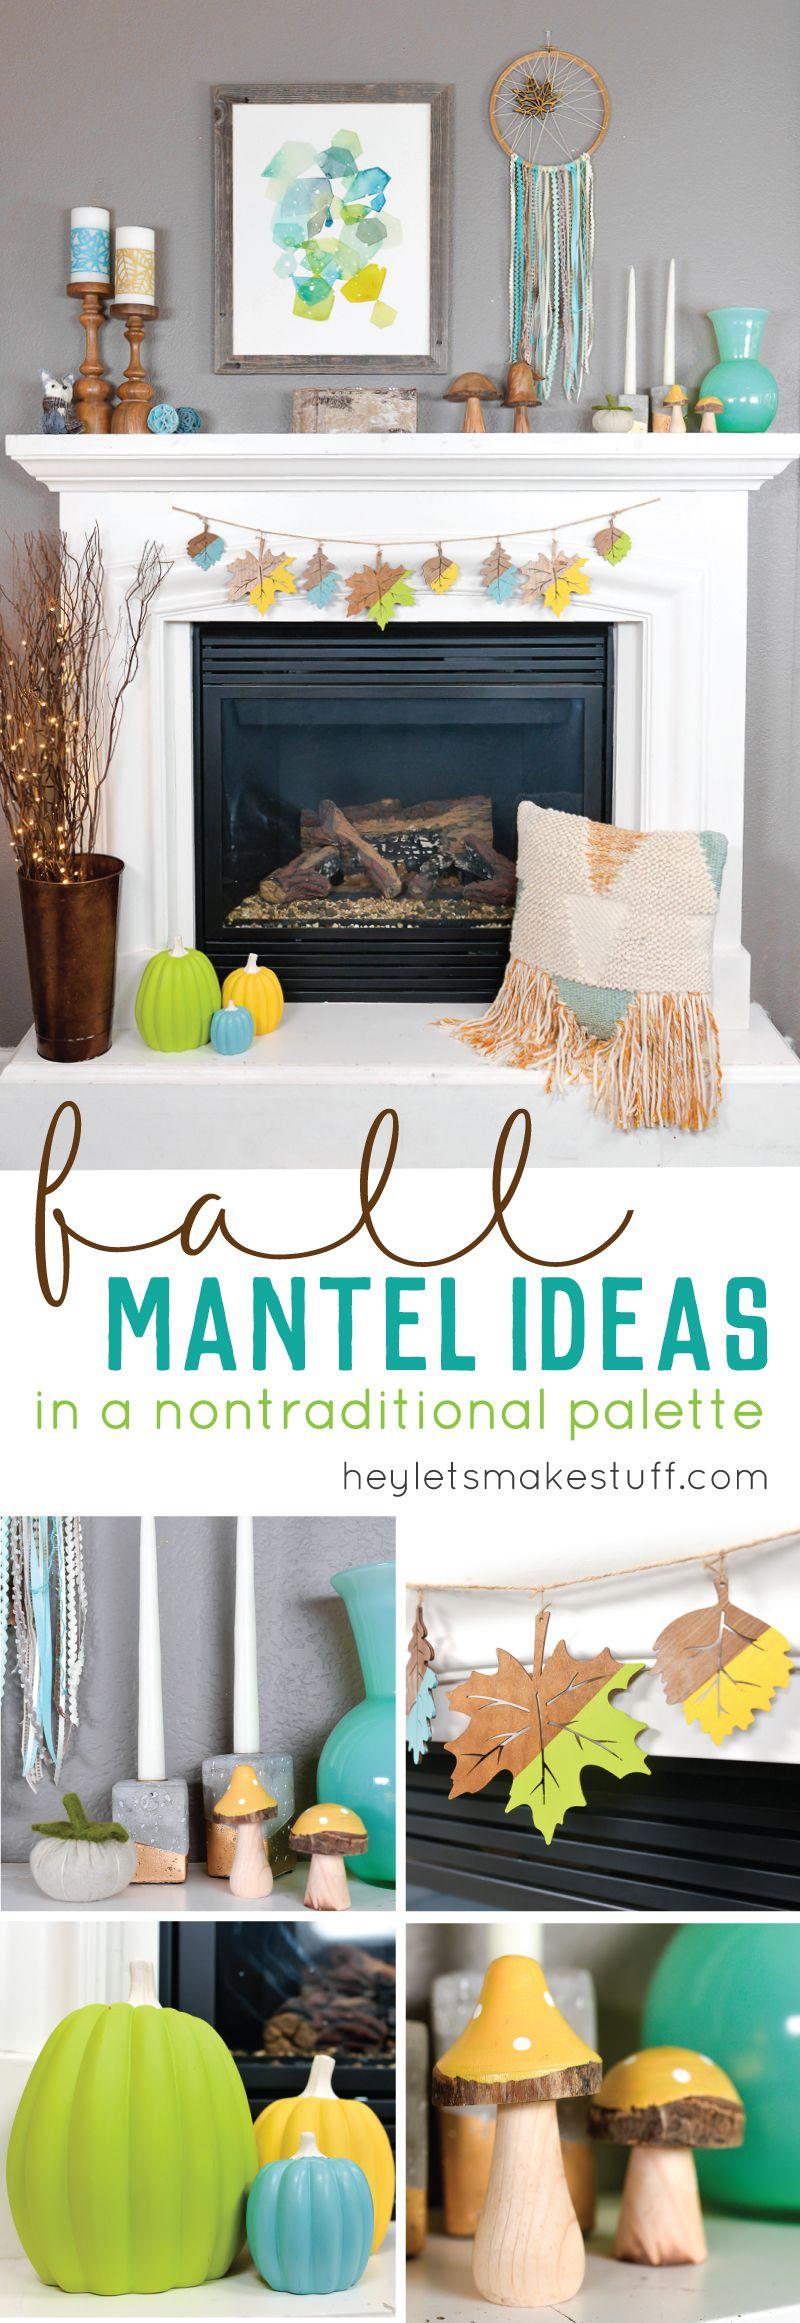 Non-Traditional Fall Mantel Ideas | manualidades ...